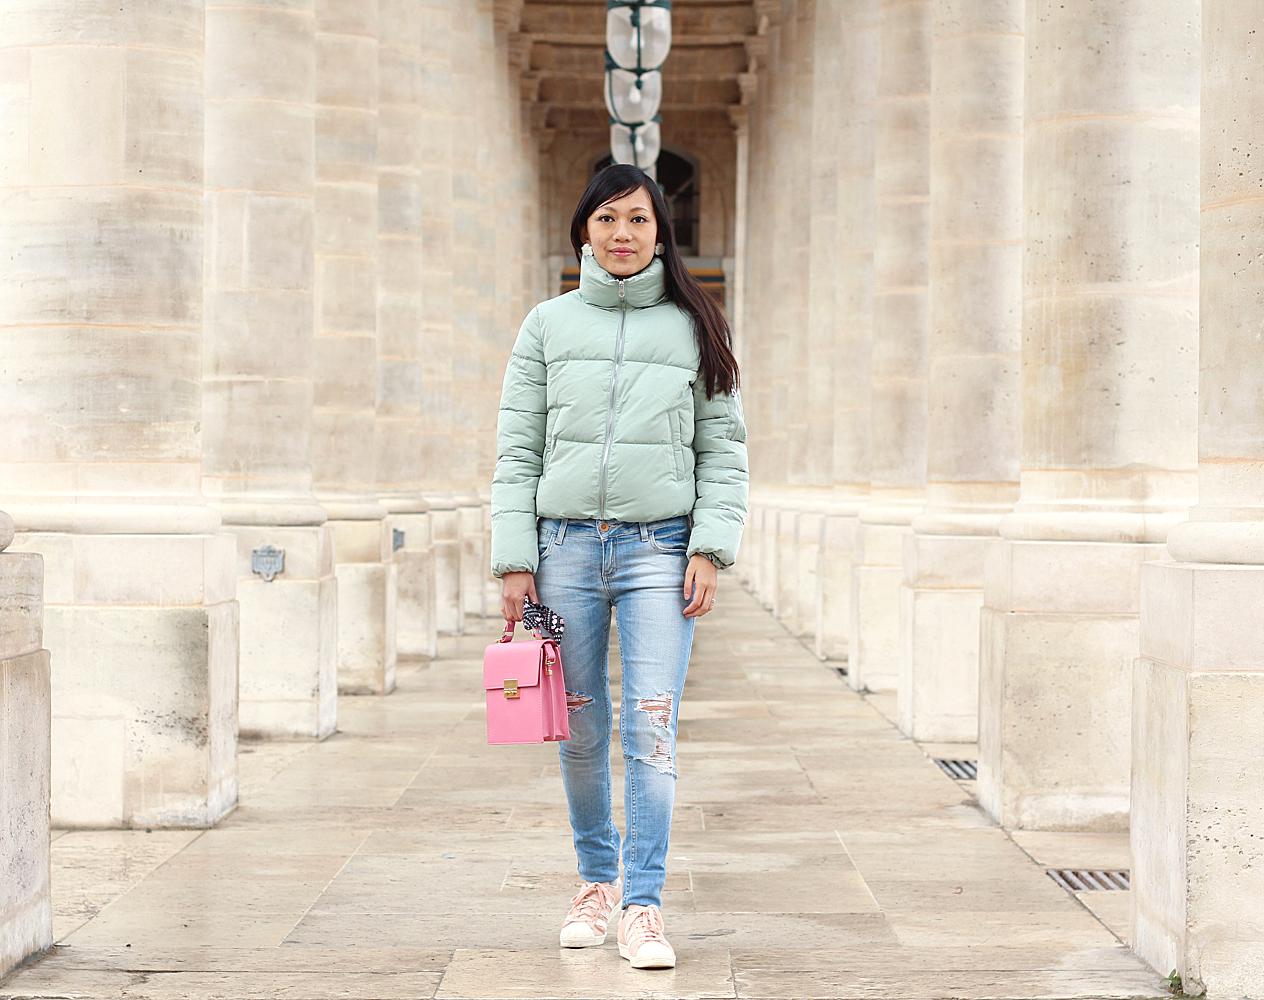 Petite and So What - Doudoune Bershka - Sac et Jeans Zara et Superstar rose